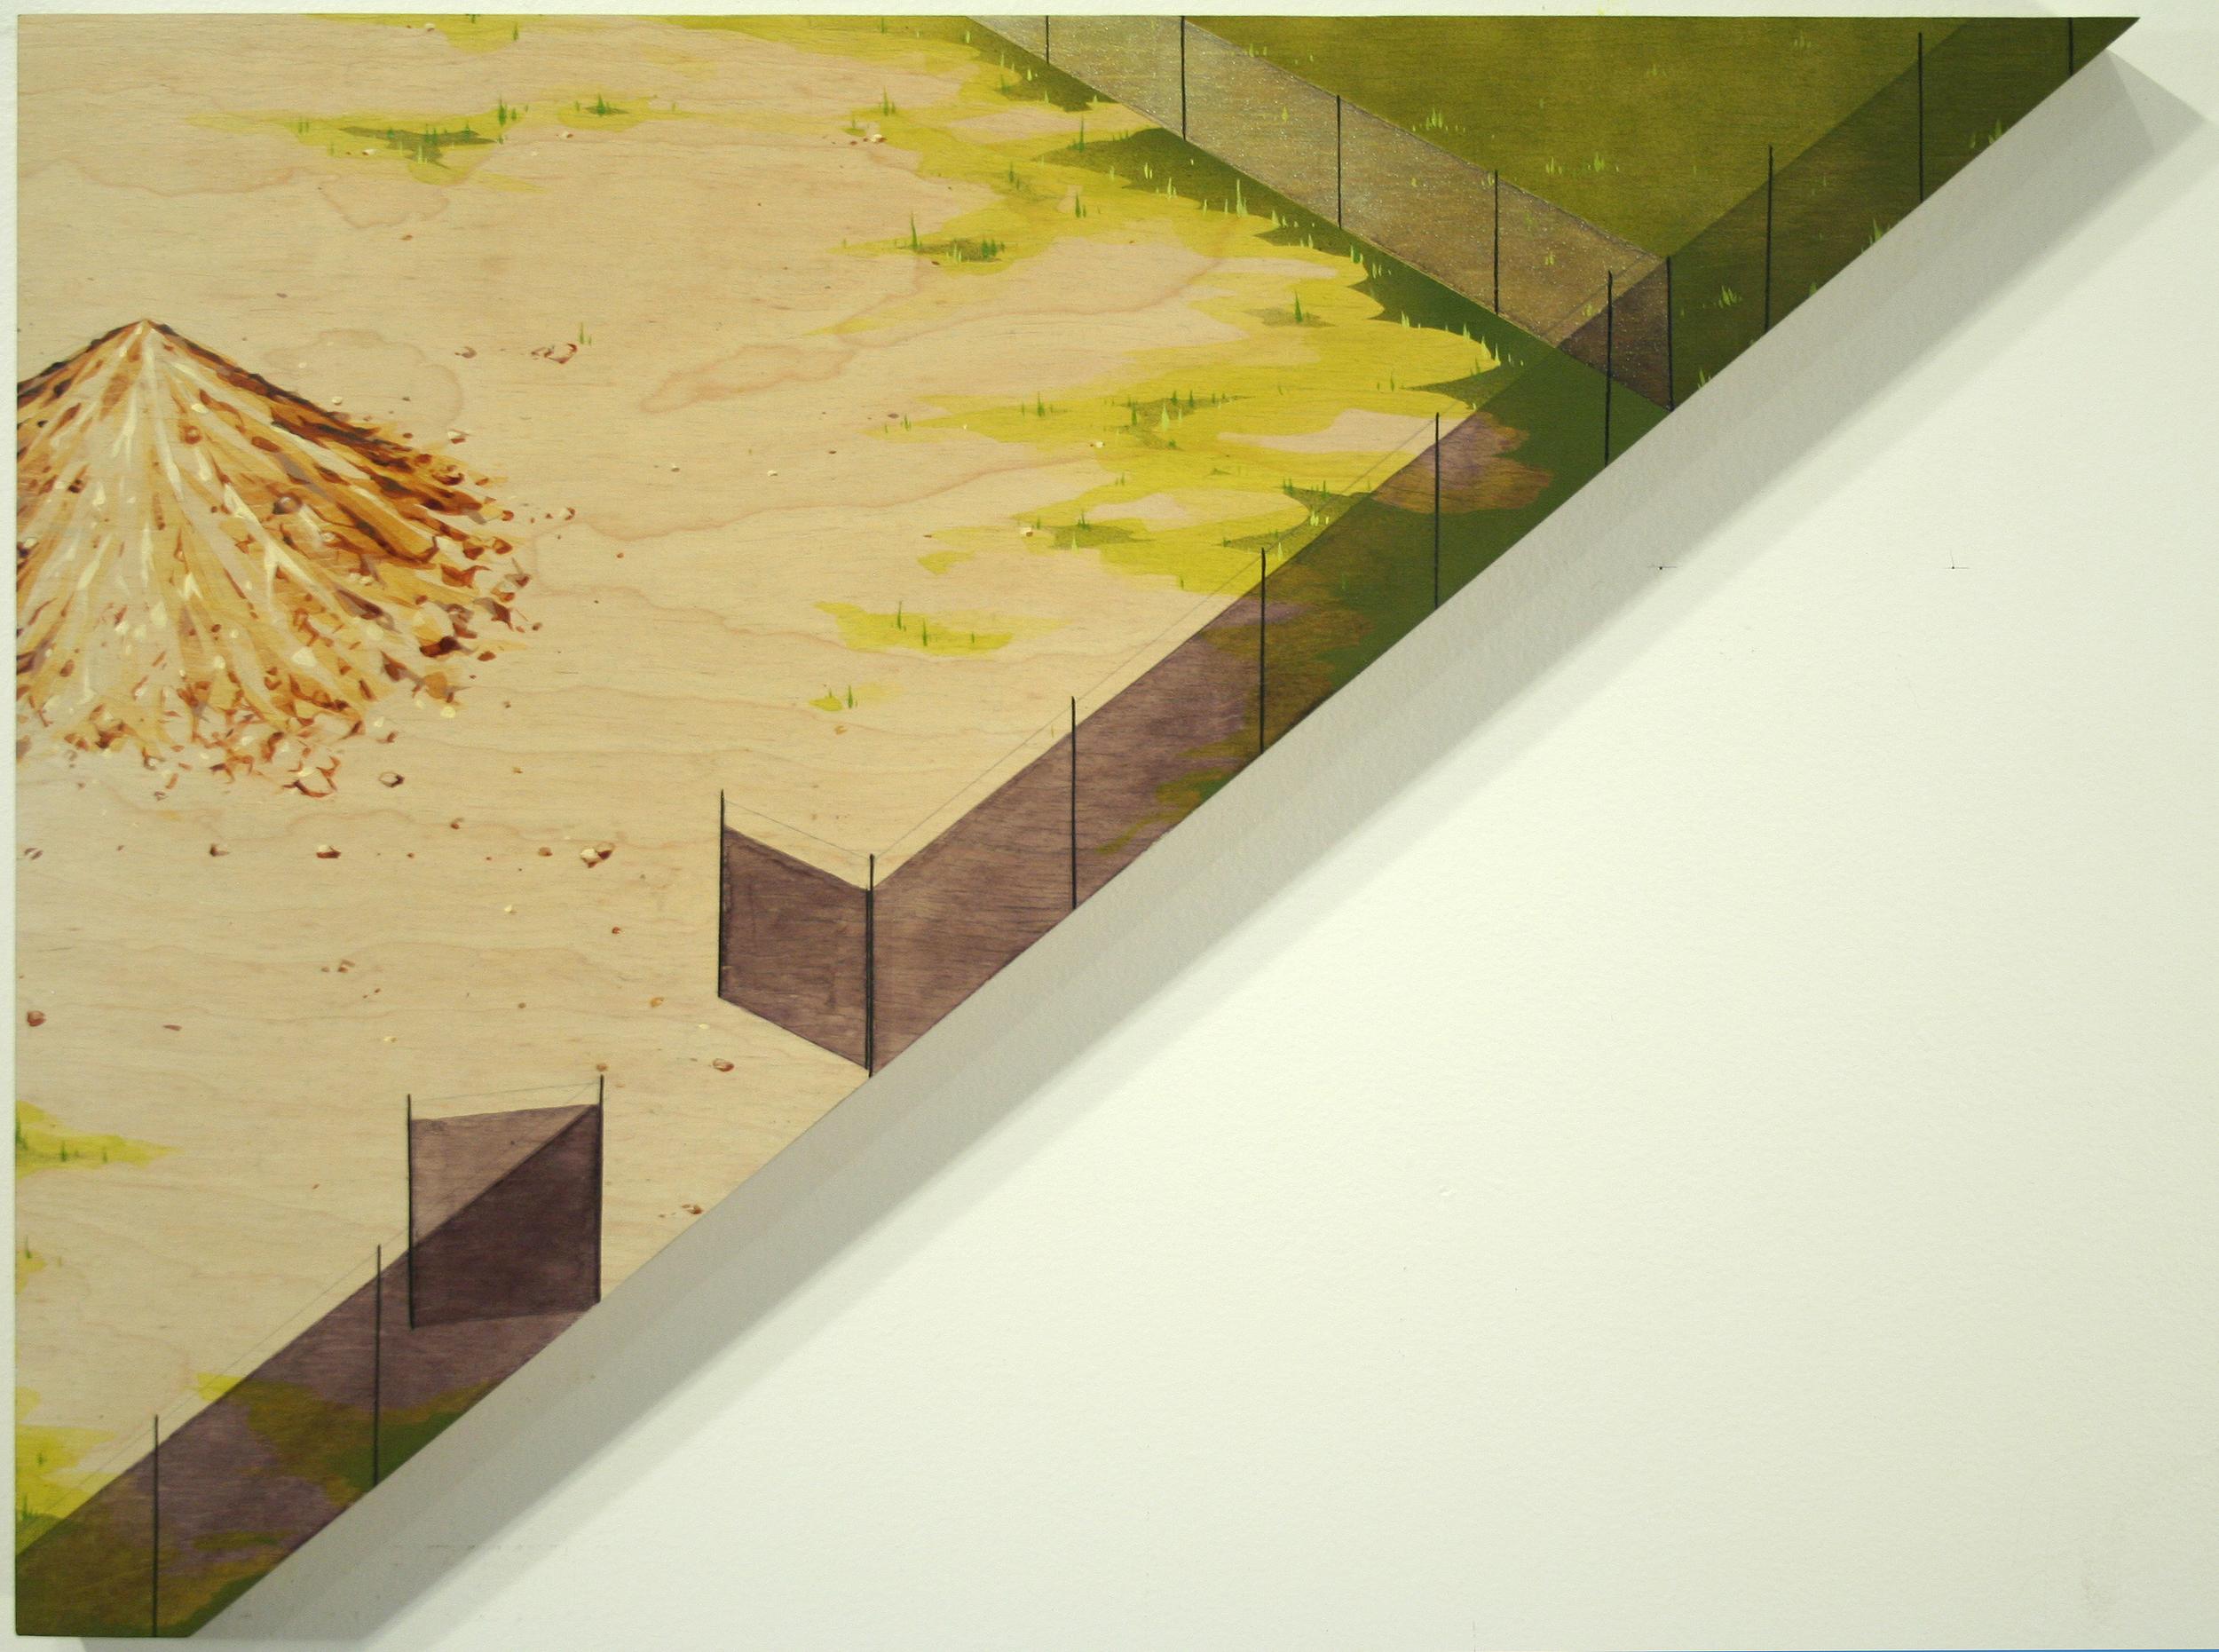 Chris Ballantyne   Storage Space  2015 acrylic on panel 18.38 x 23.65 in (triangular)